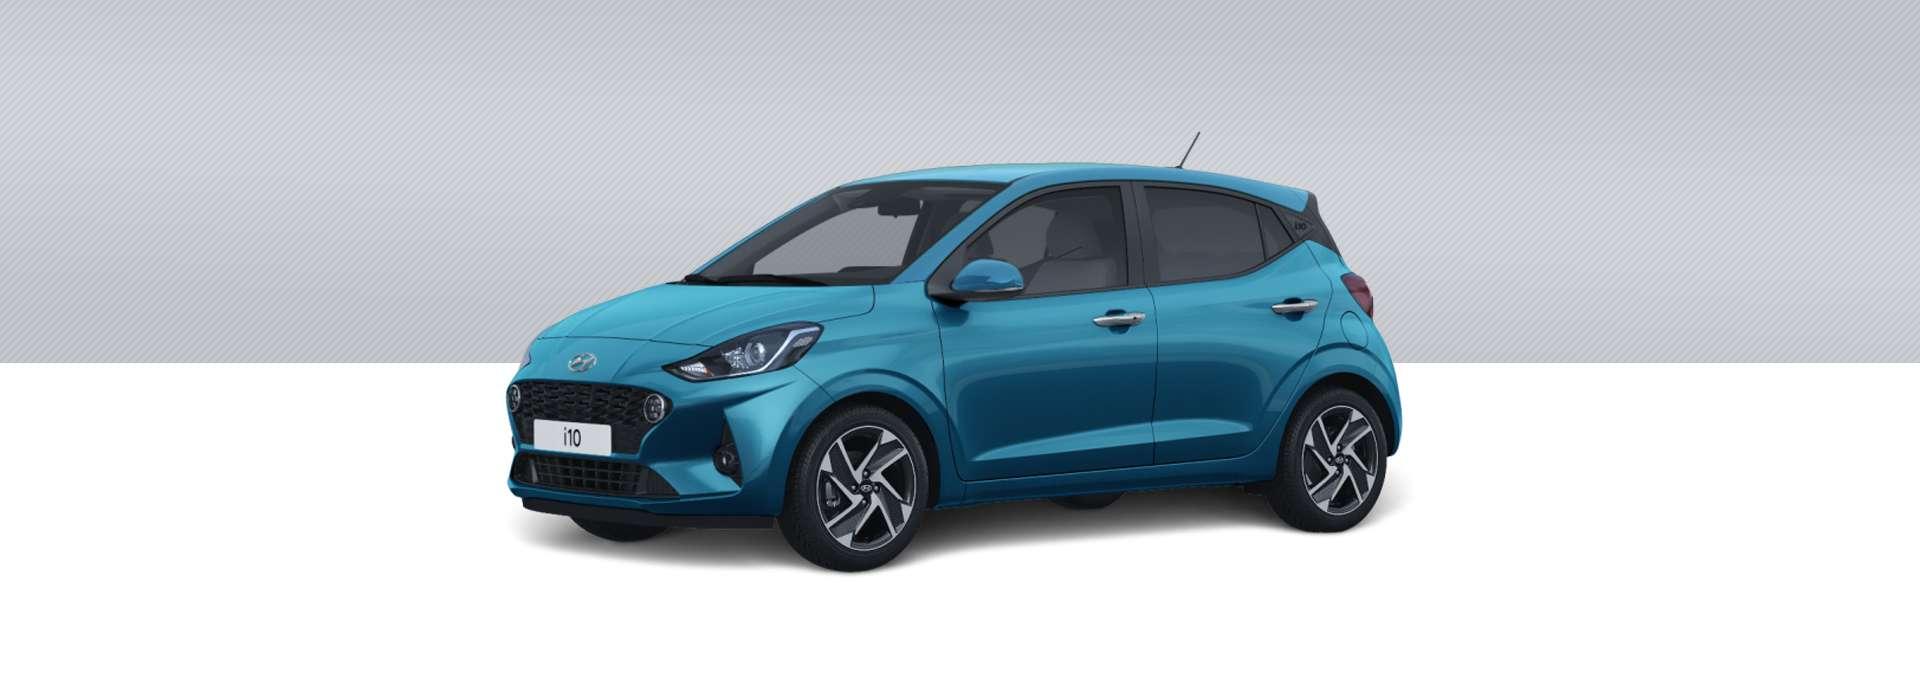 Hyundai Nuevo i10